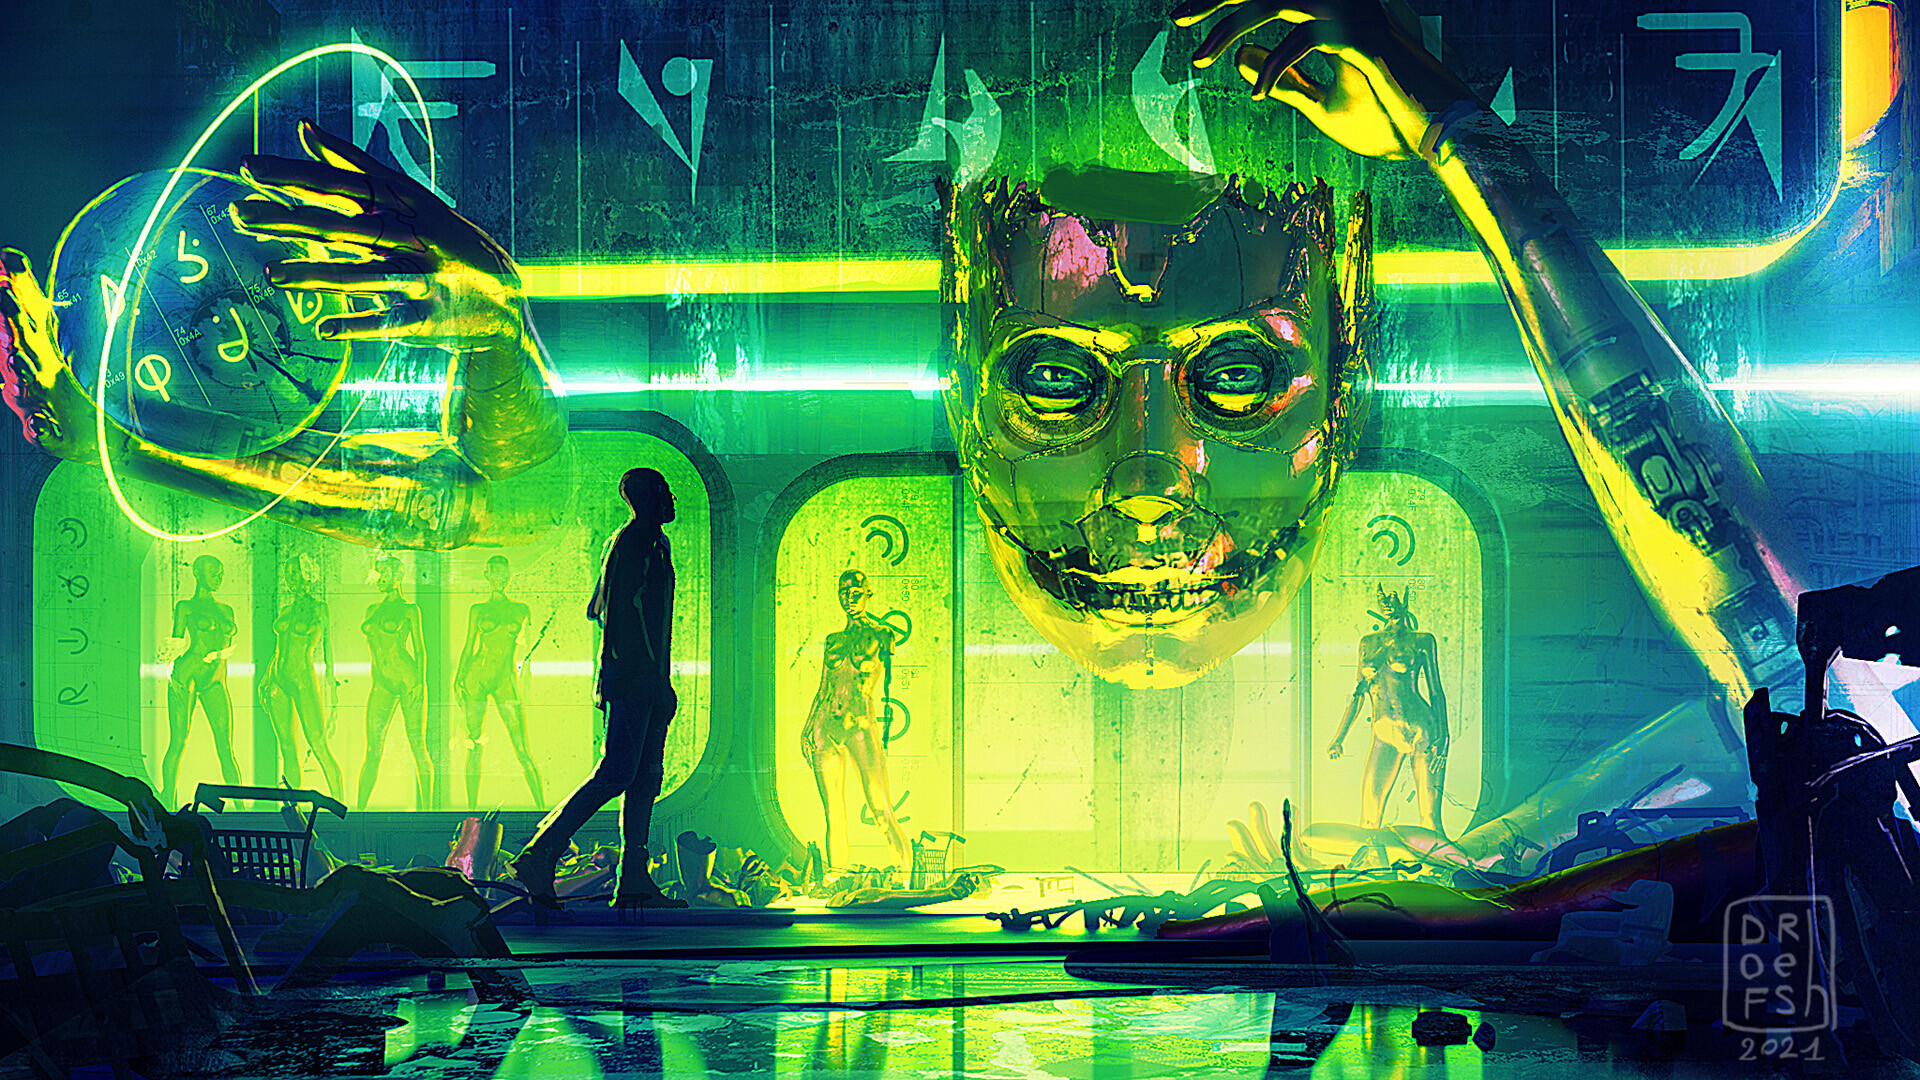 Artwork Science Fiction Cyberpunk 1920x1080